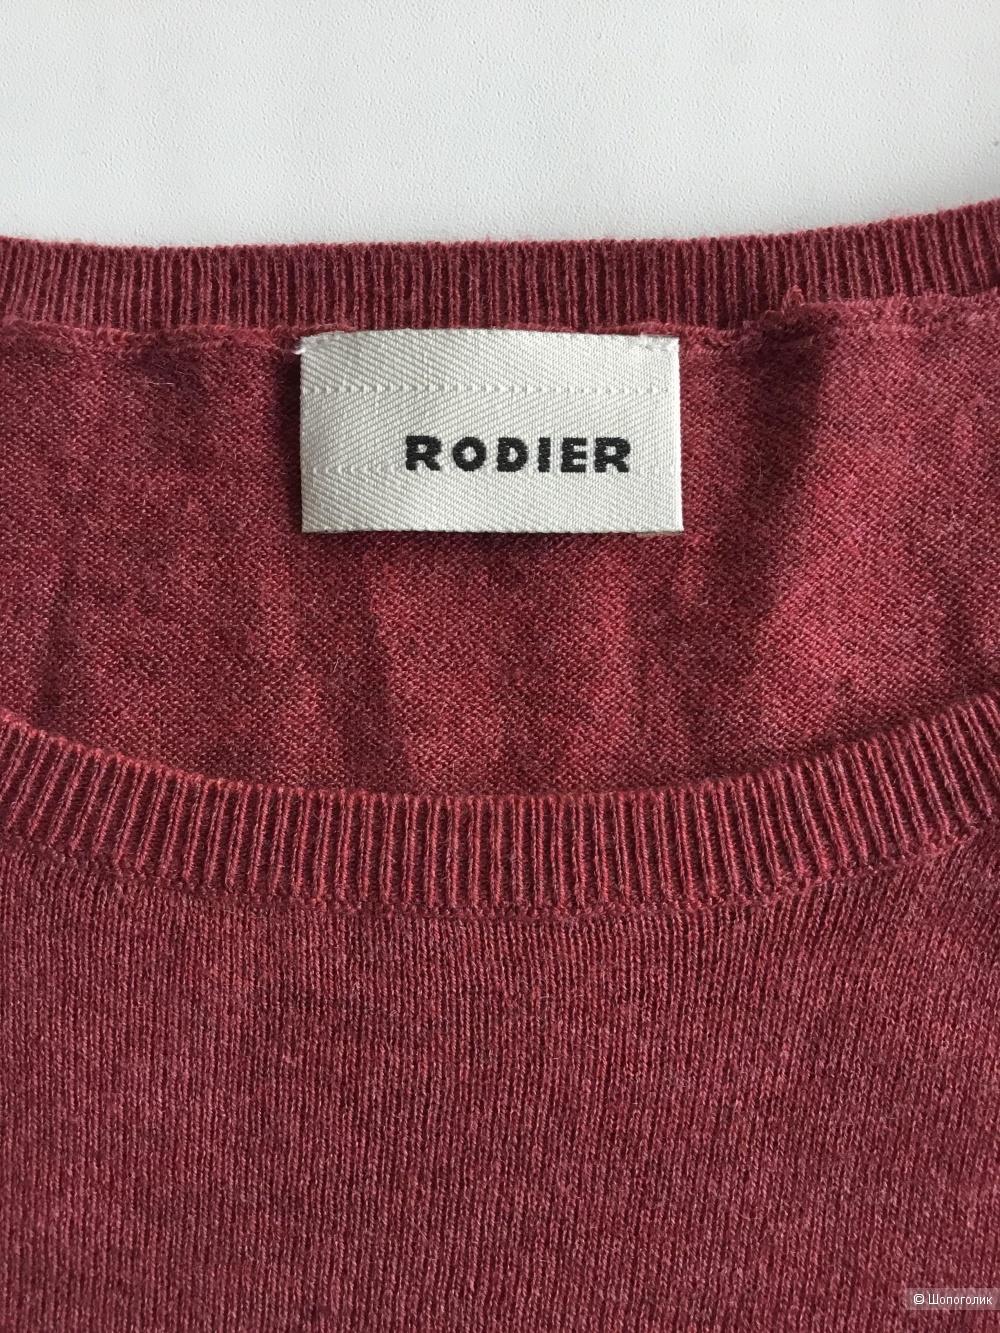 Кофточка  Rodier 44- 46 размер